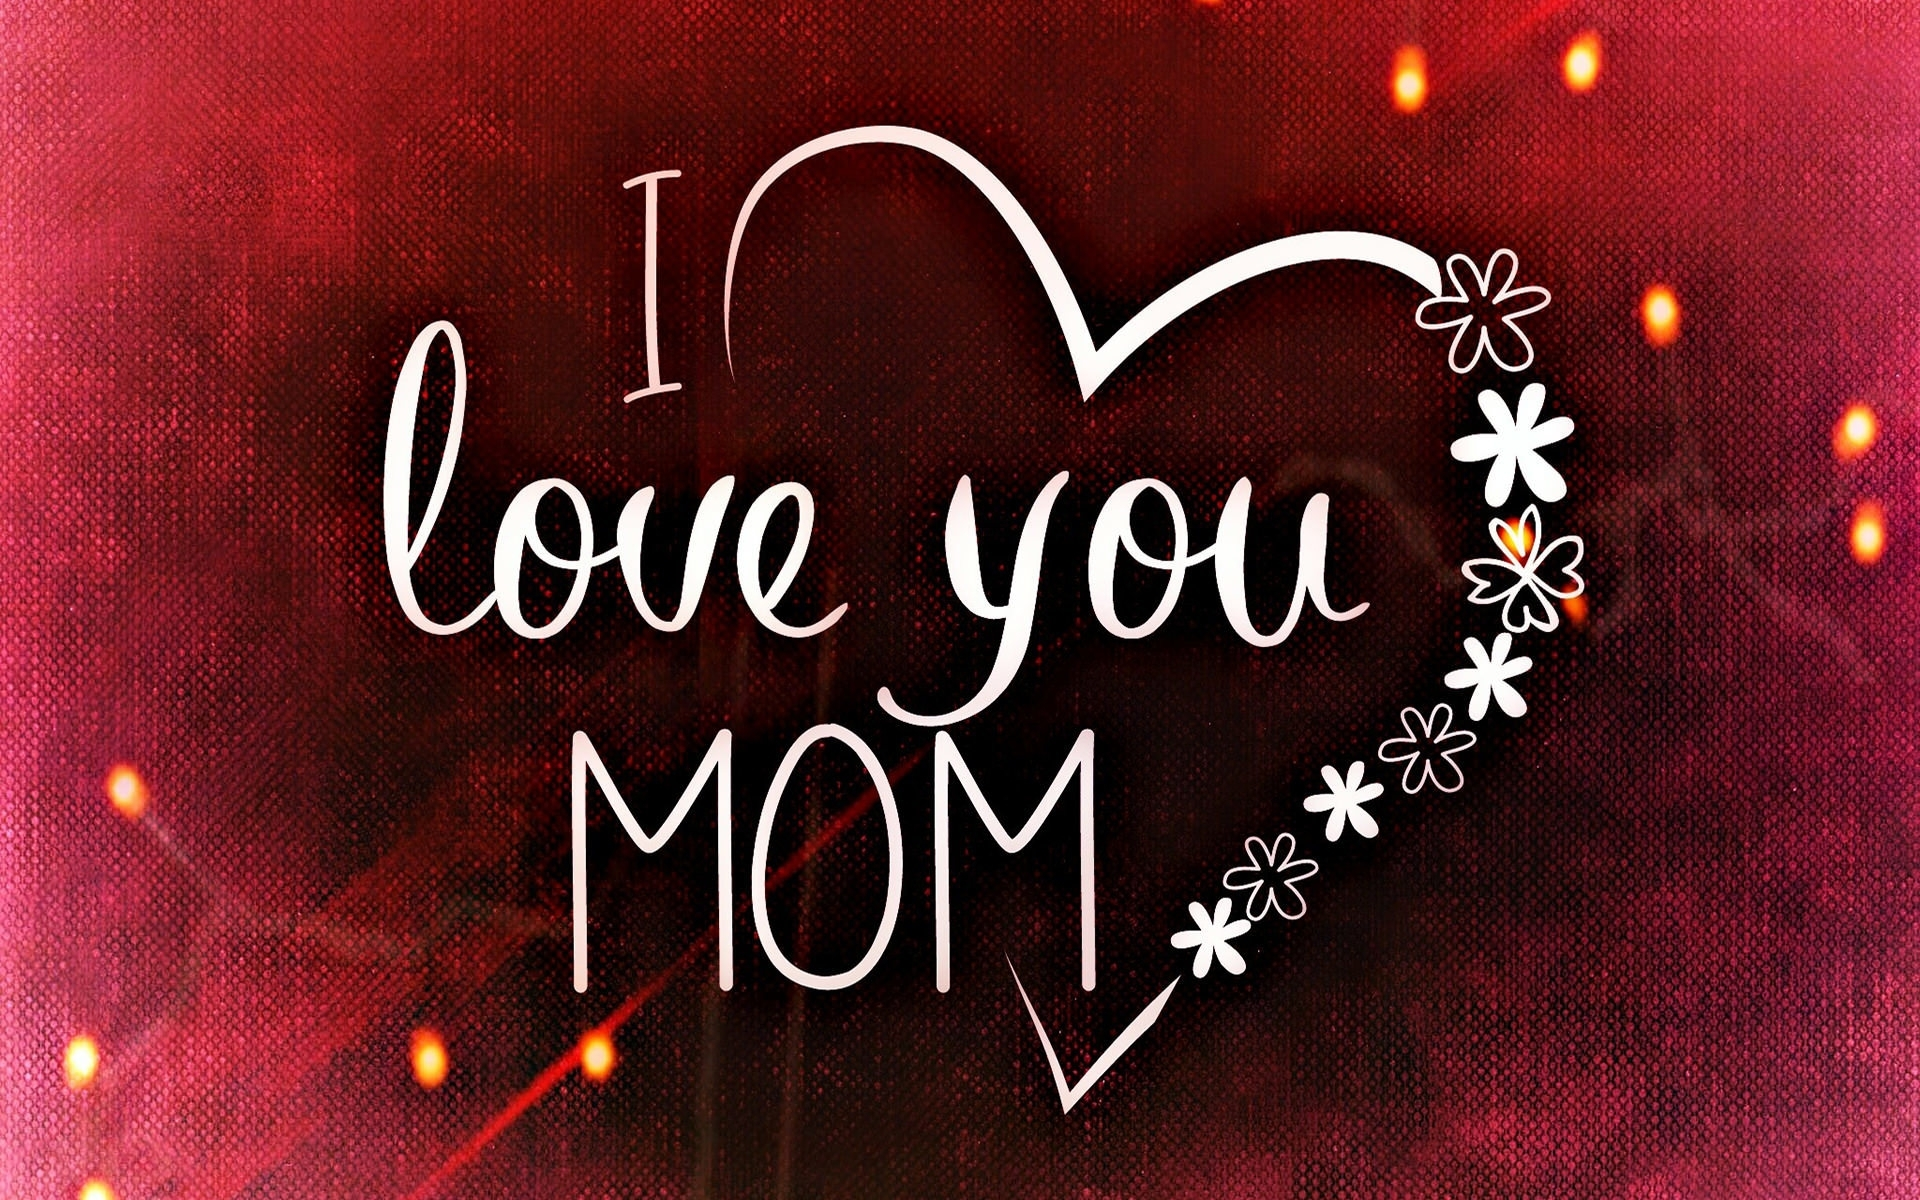 i-love-you-mom-wallpaper-hd - wallpaper.wiki